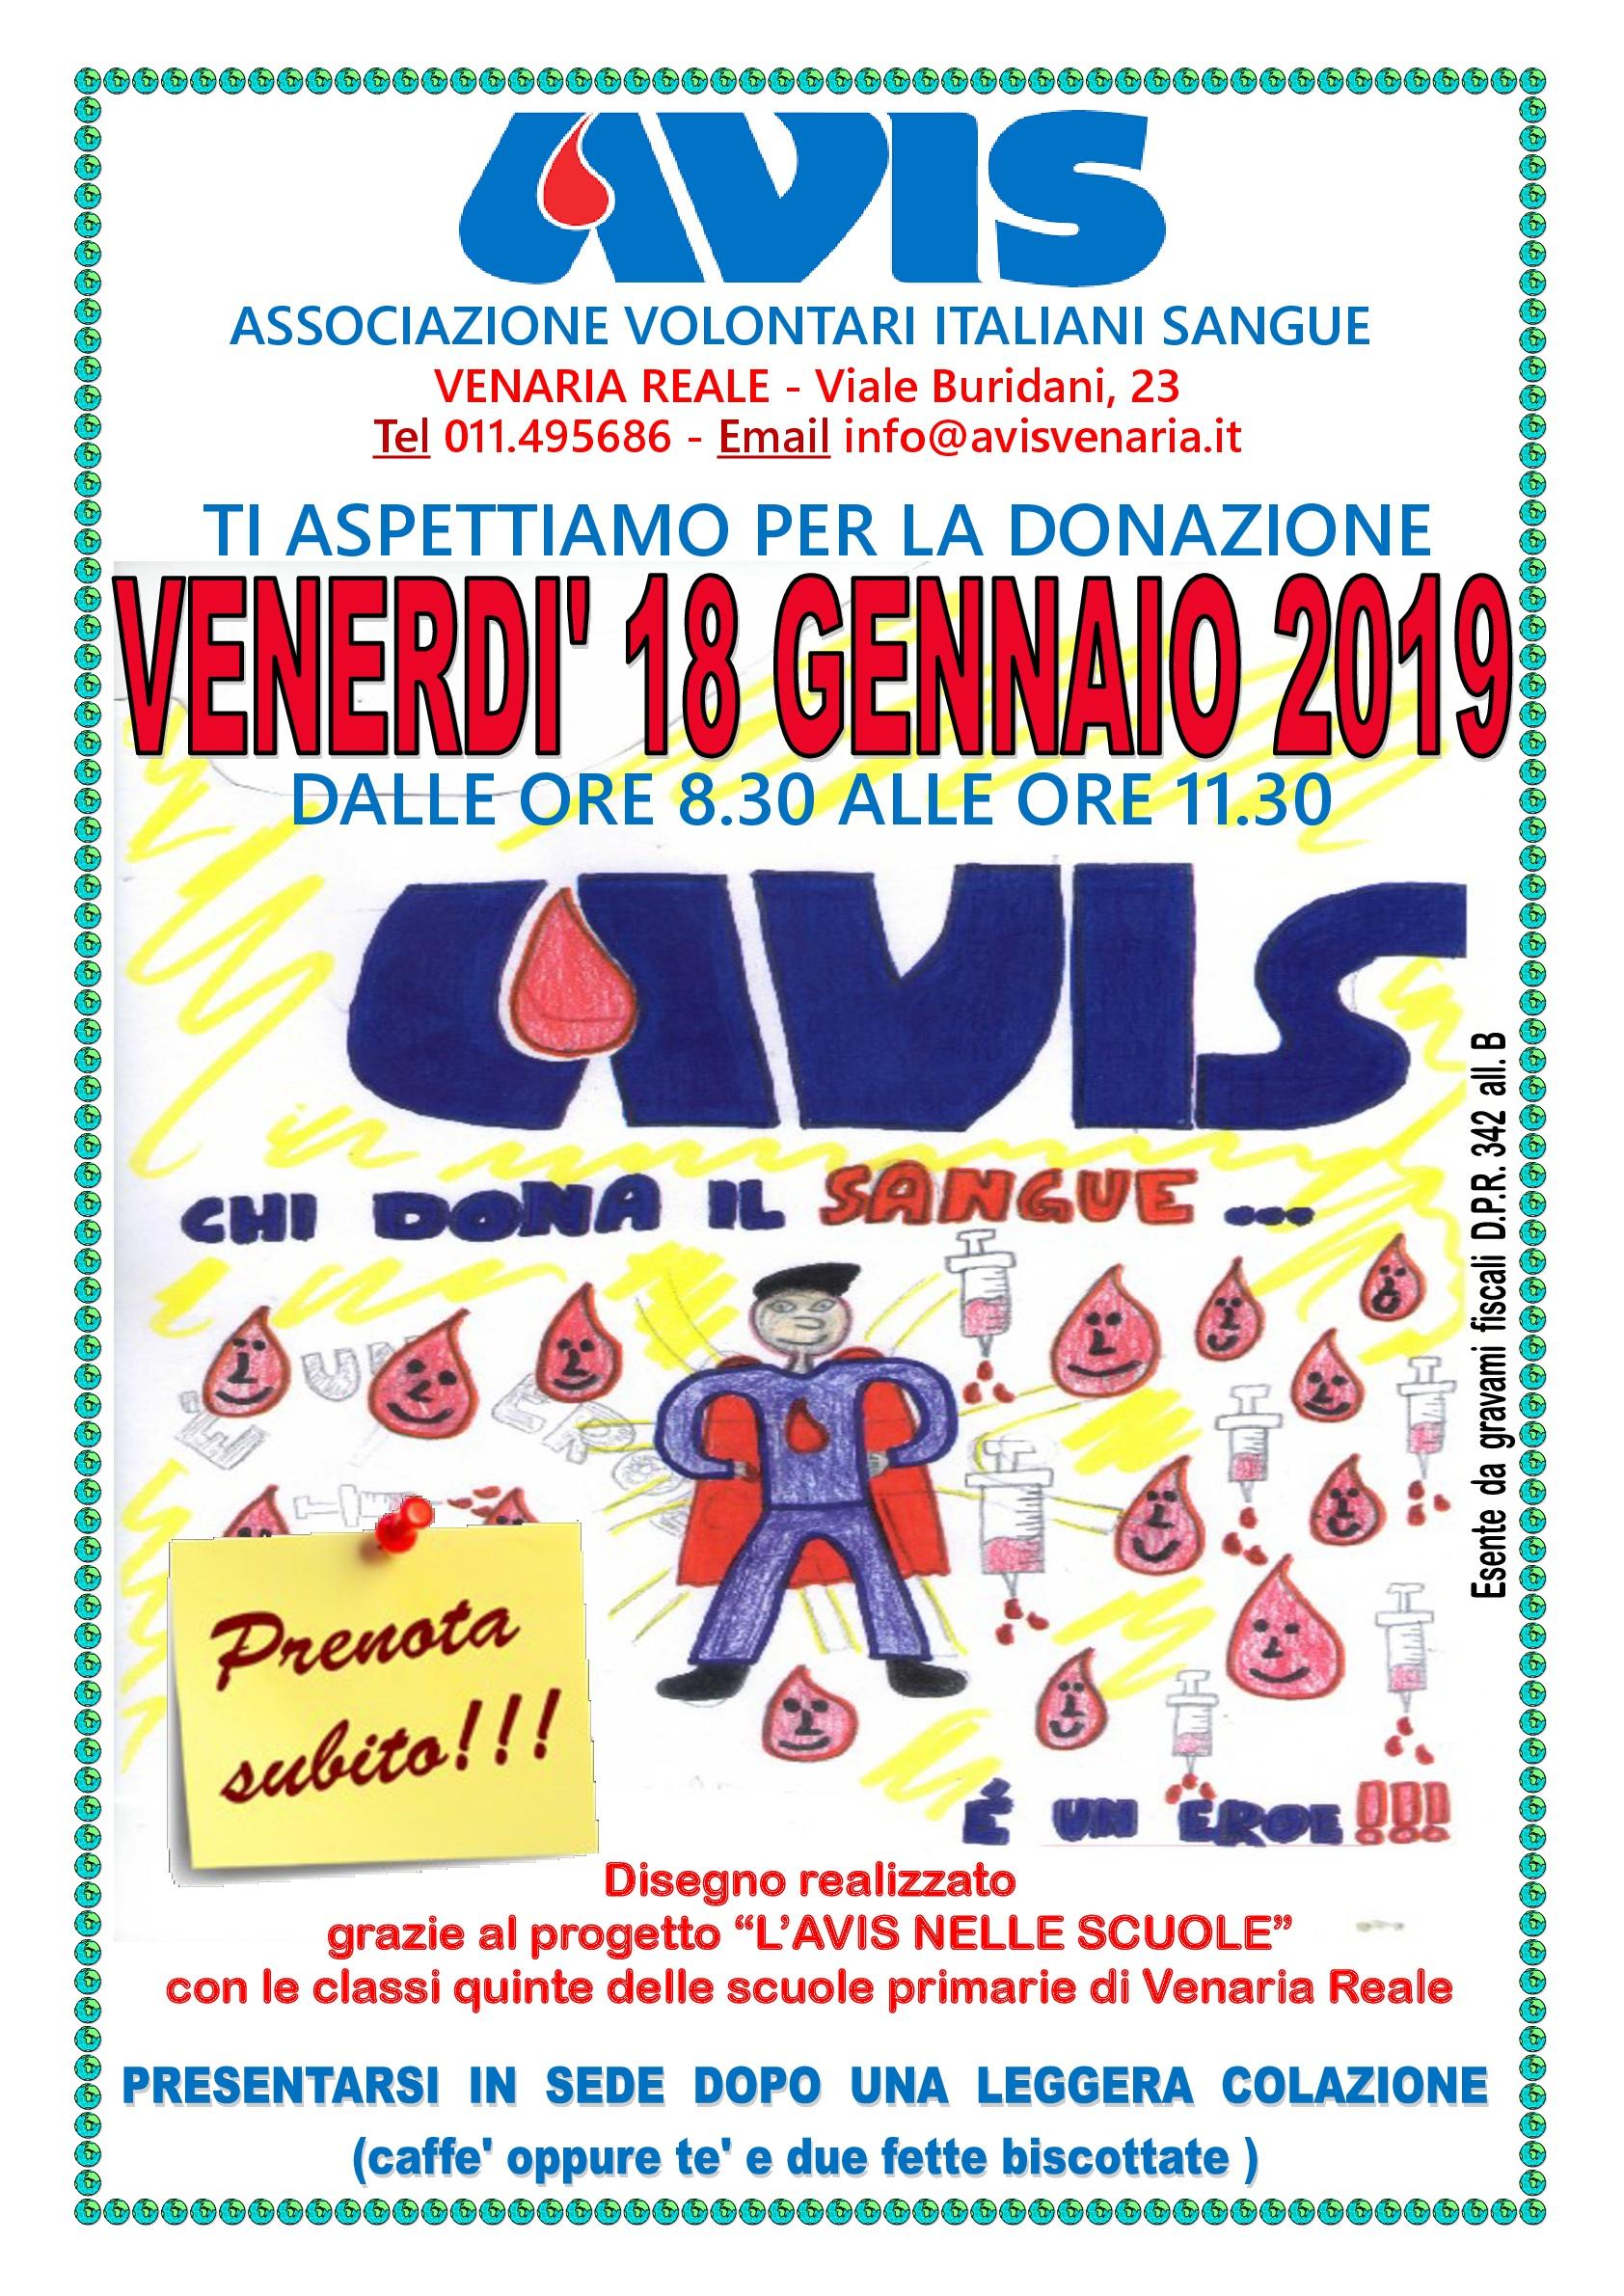 Donazione sangue di Venerdì 18 gennaio 2019